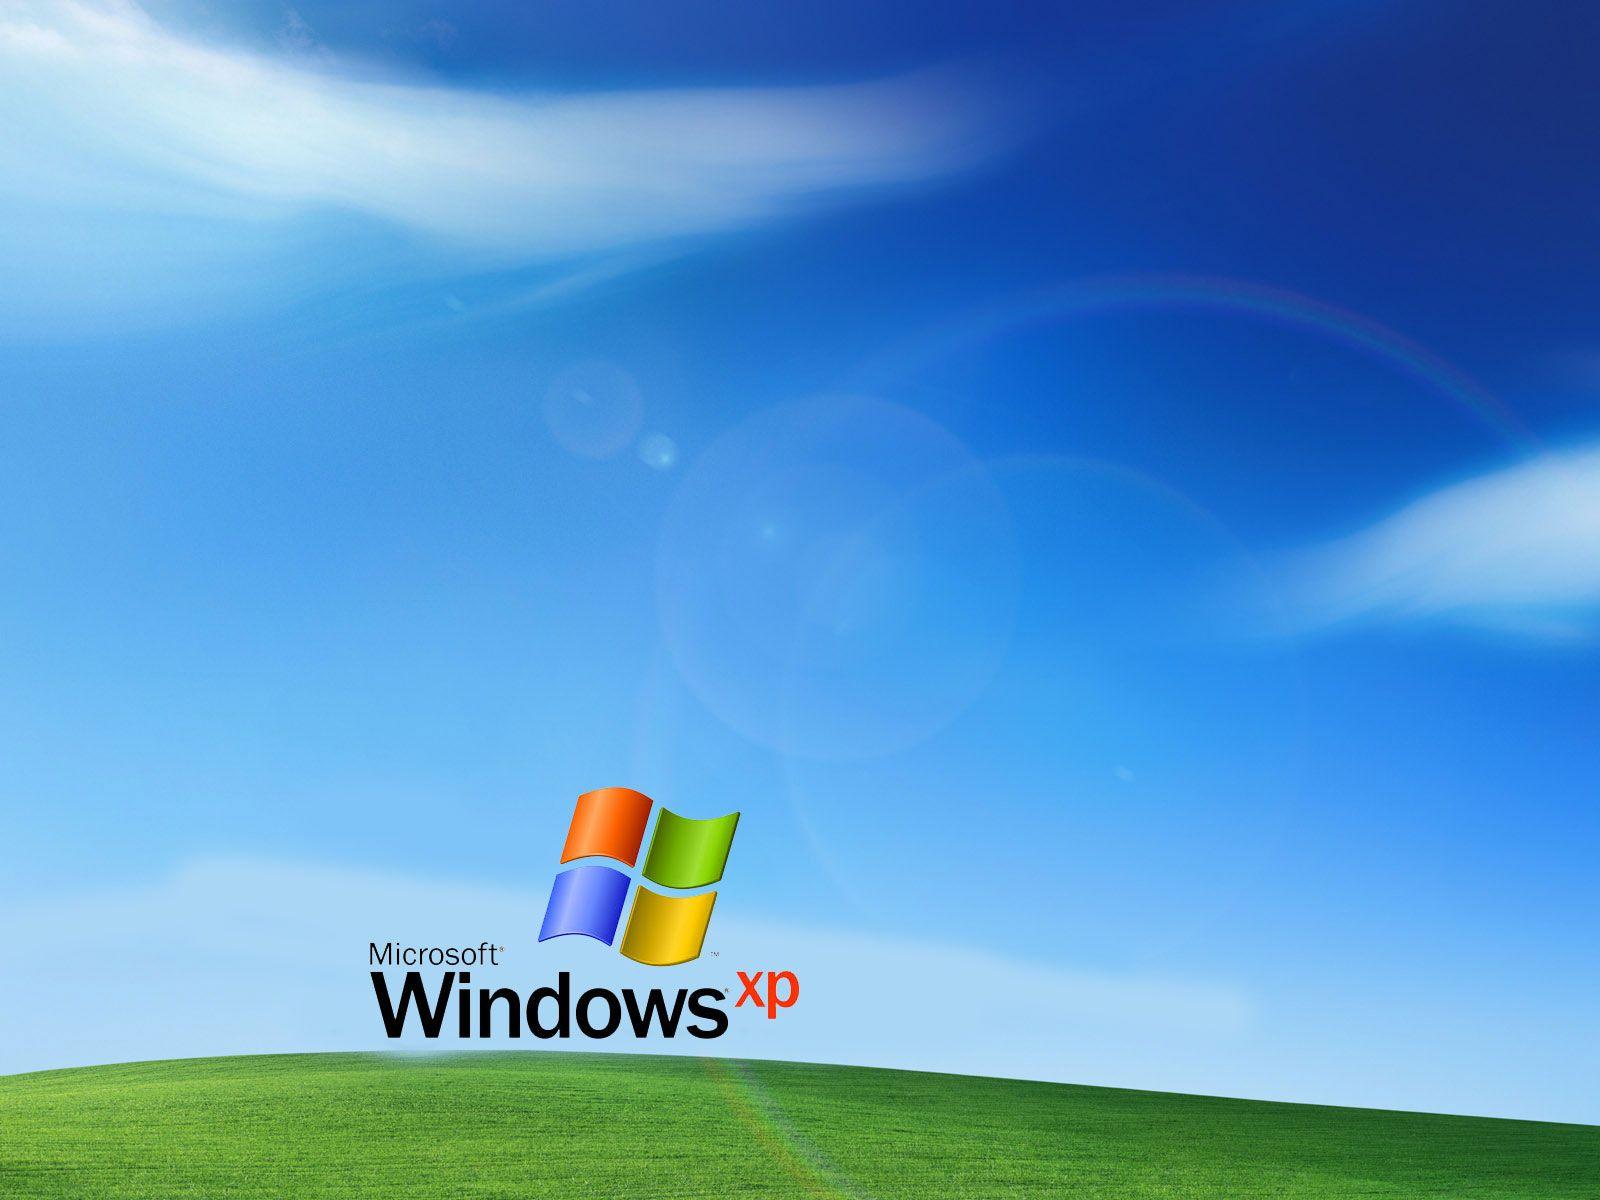 Cool Funny Windows 7 Backgrounds 31787 Windows Xp Windows Desktop Wallpaper Original Wallpaper